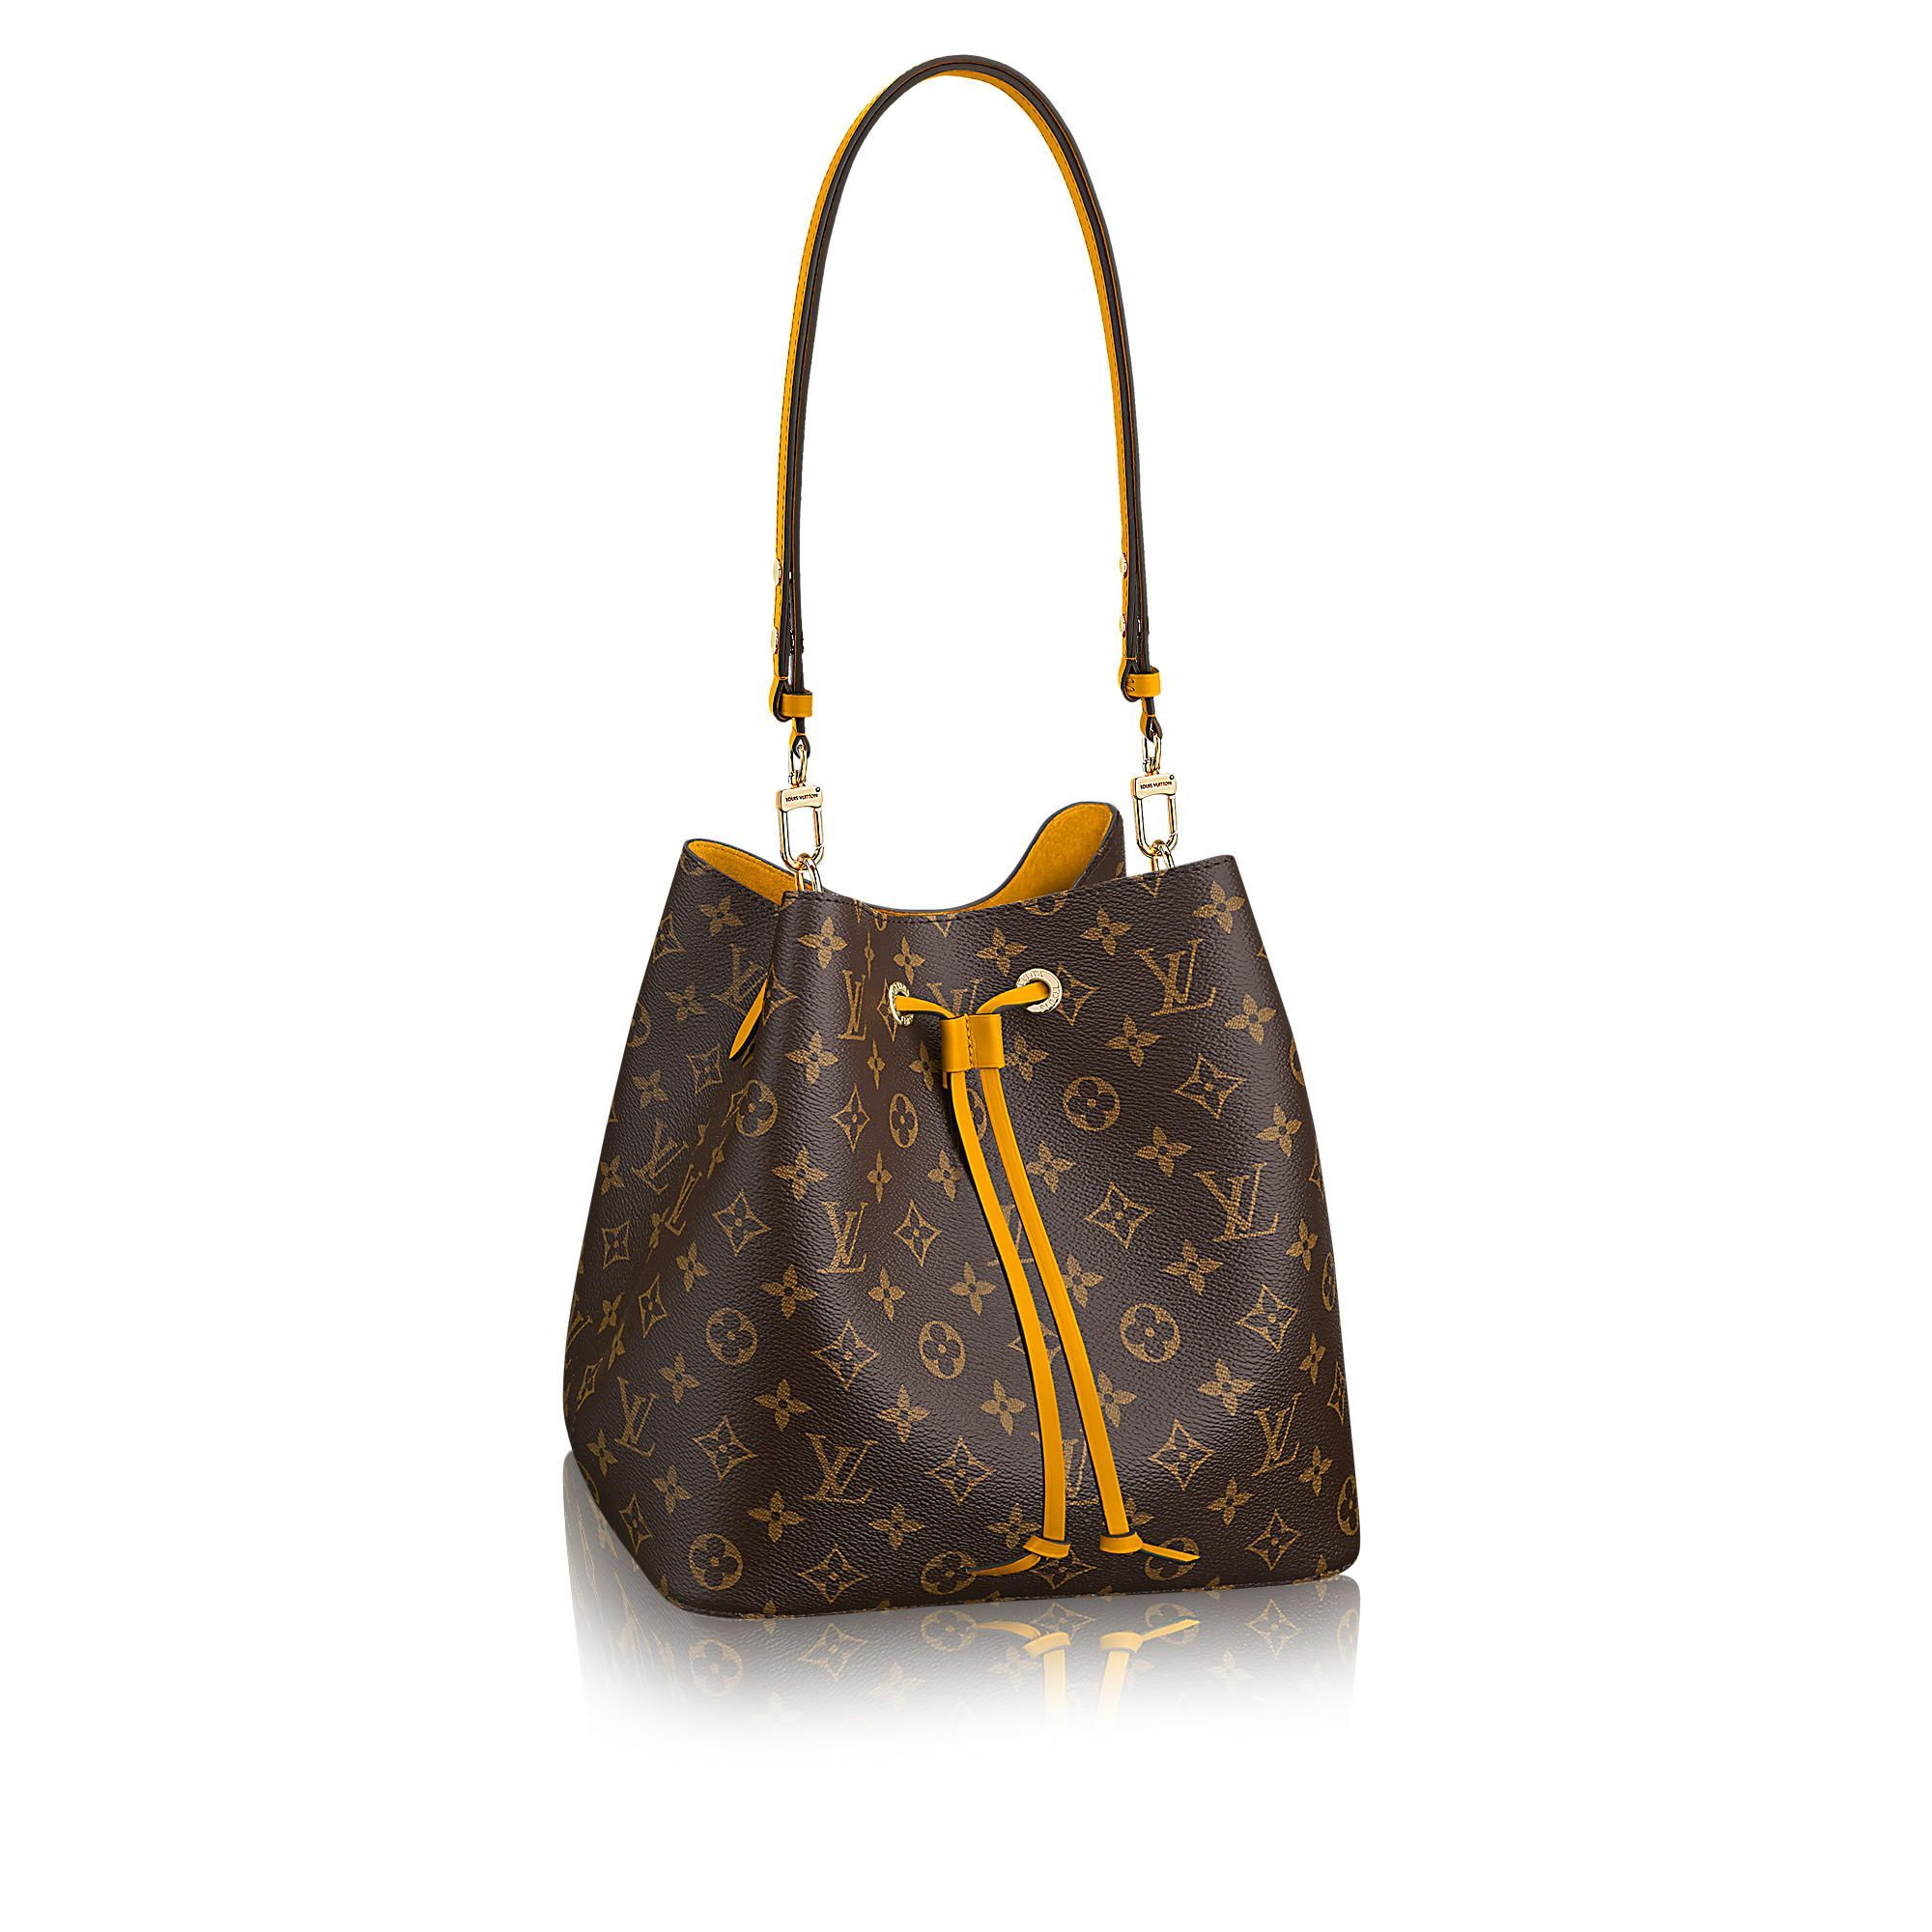 NeoNoe via Louis Vuitton   Louis Vuitton Classic Bags   Sac à Main ... aebeeb90ec7